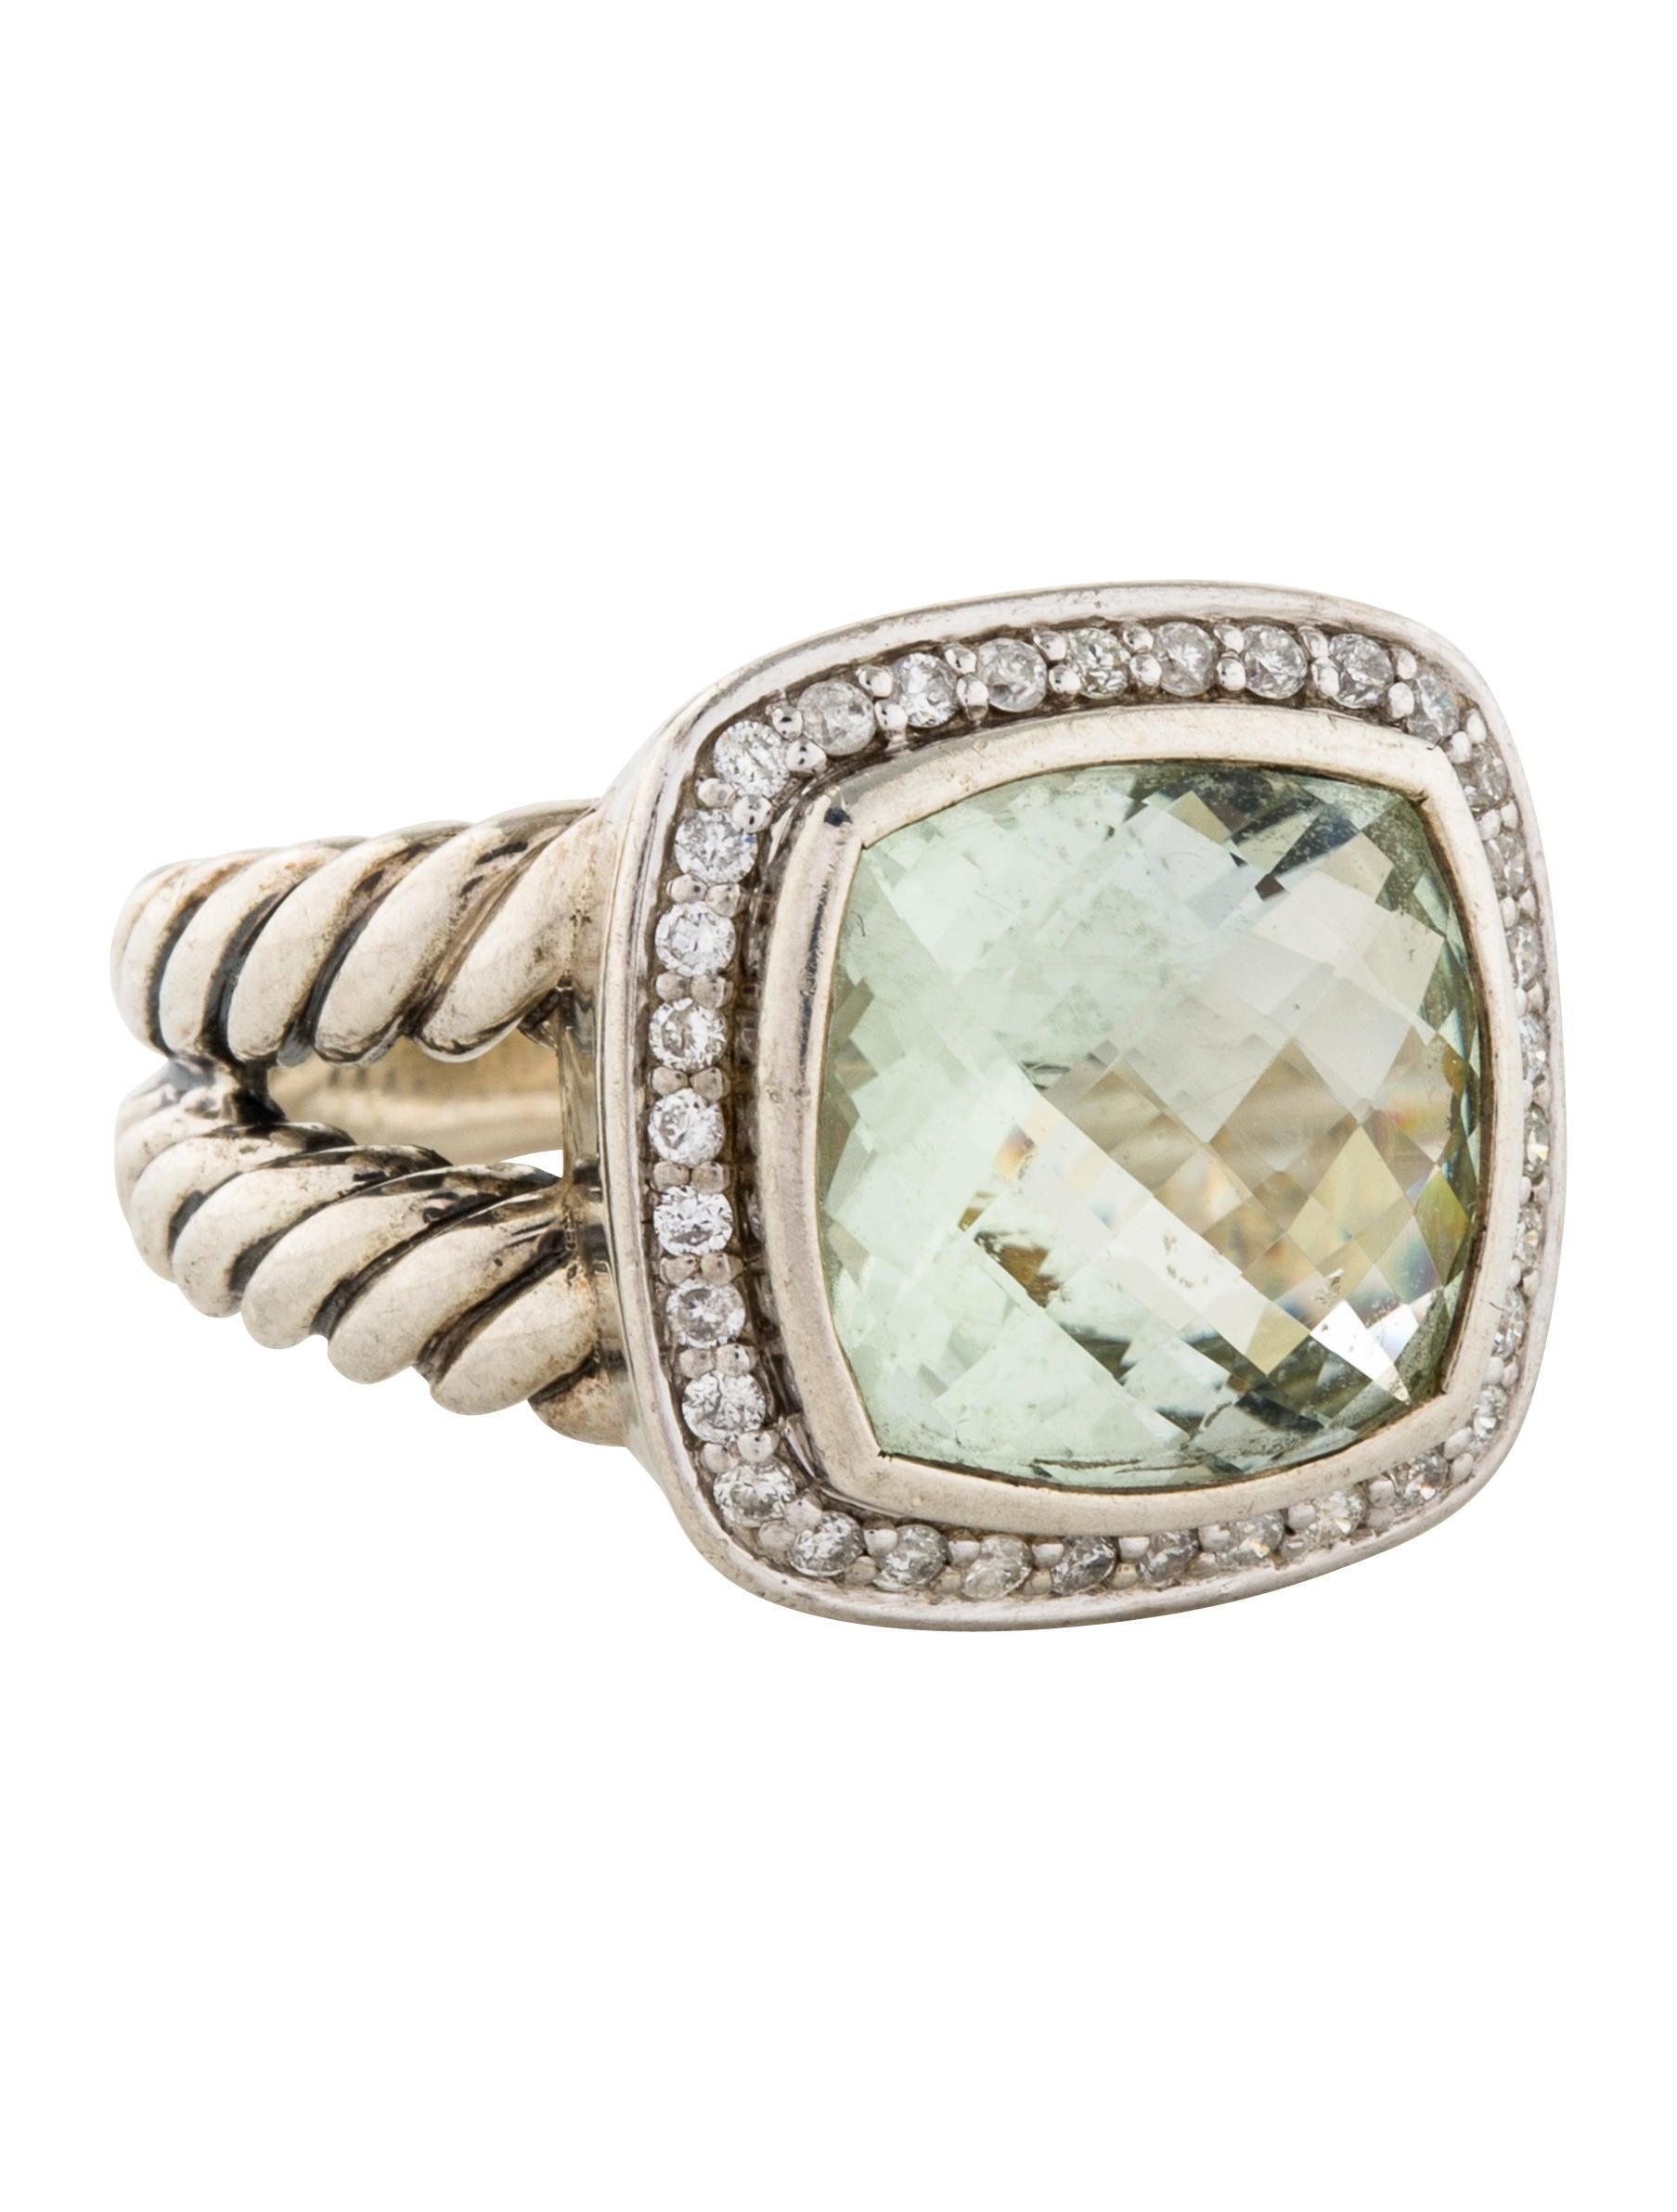 David yurman prasiolite diamond albion cocktail ring for David yurman inspired jewelry rings